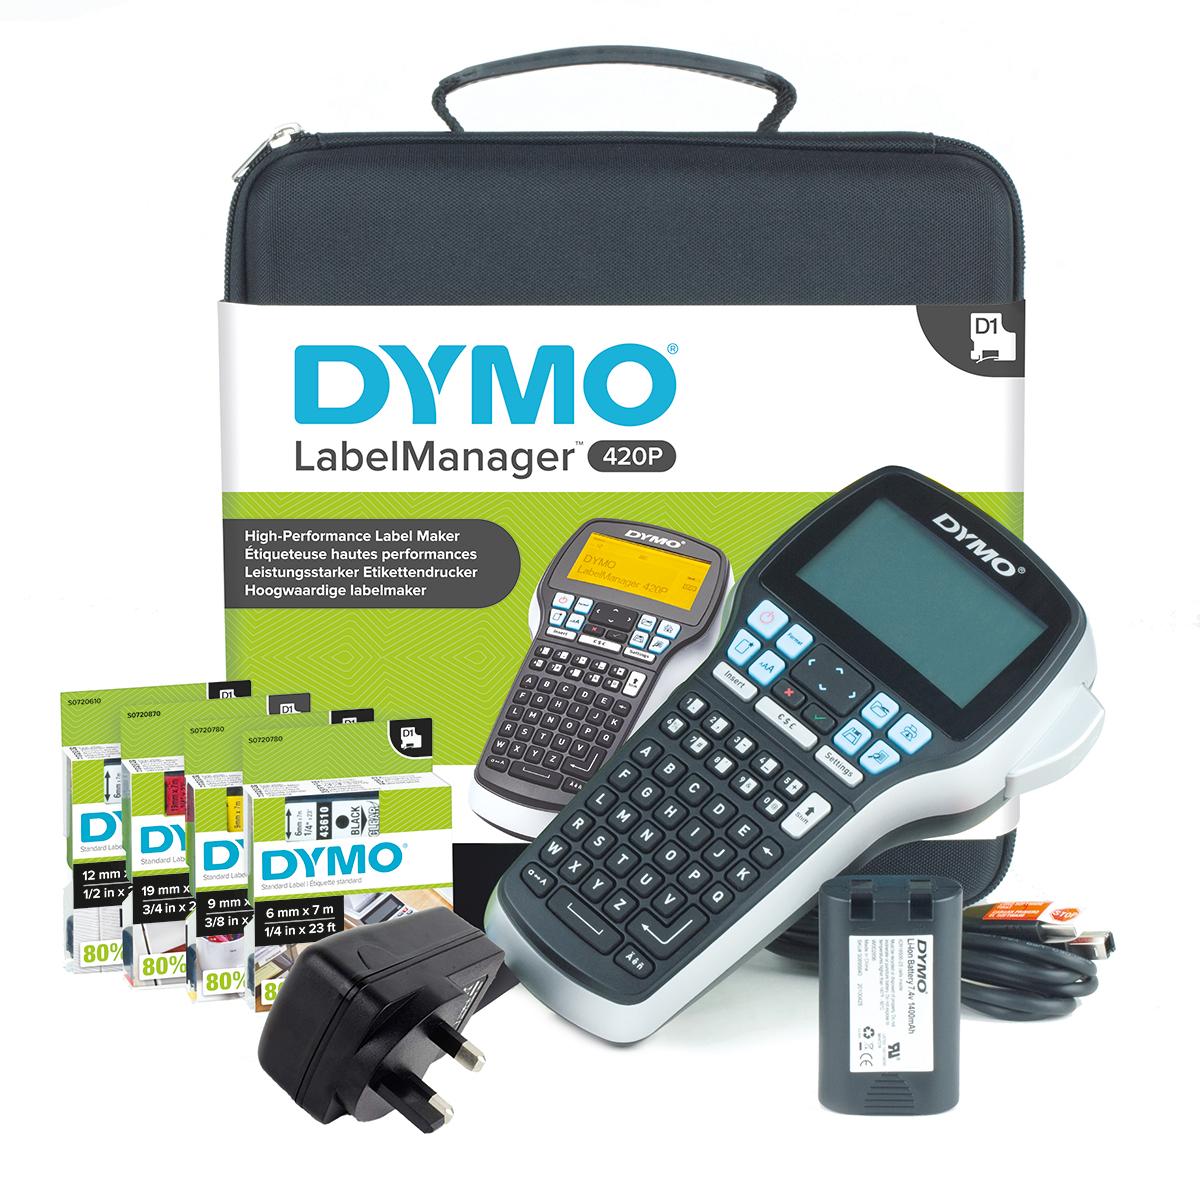 Dymo Labelmanager 420 Label Maker Kit